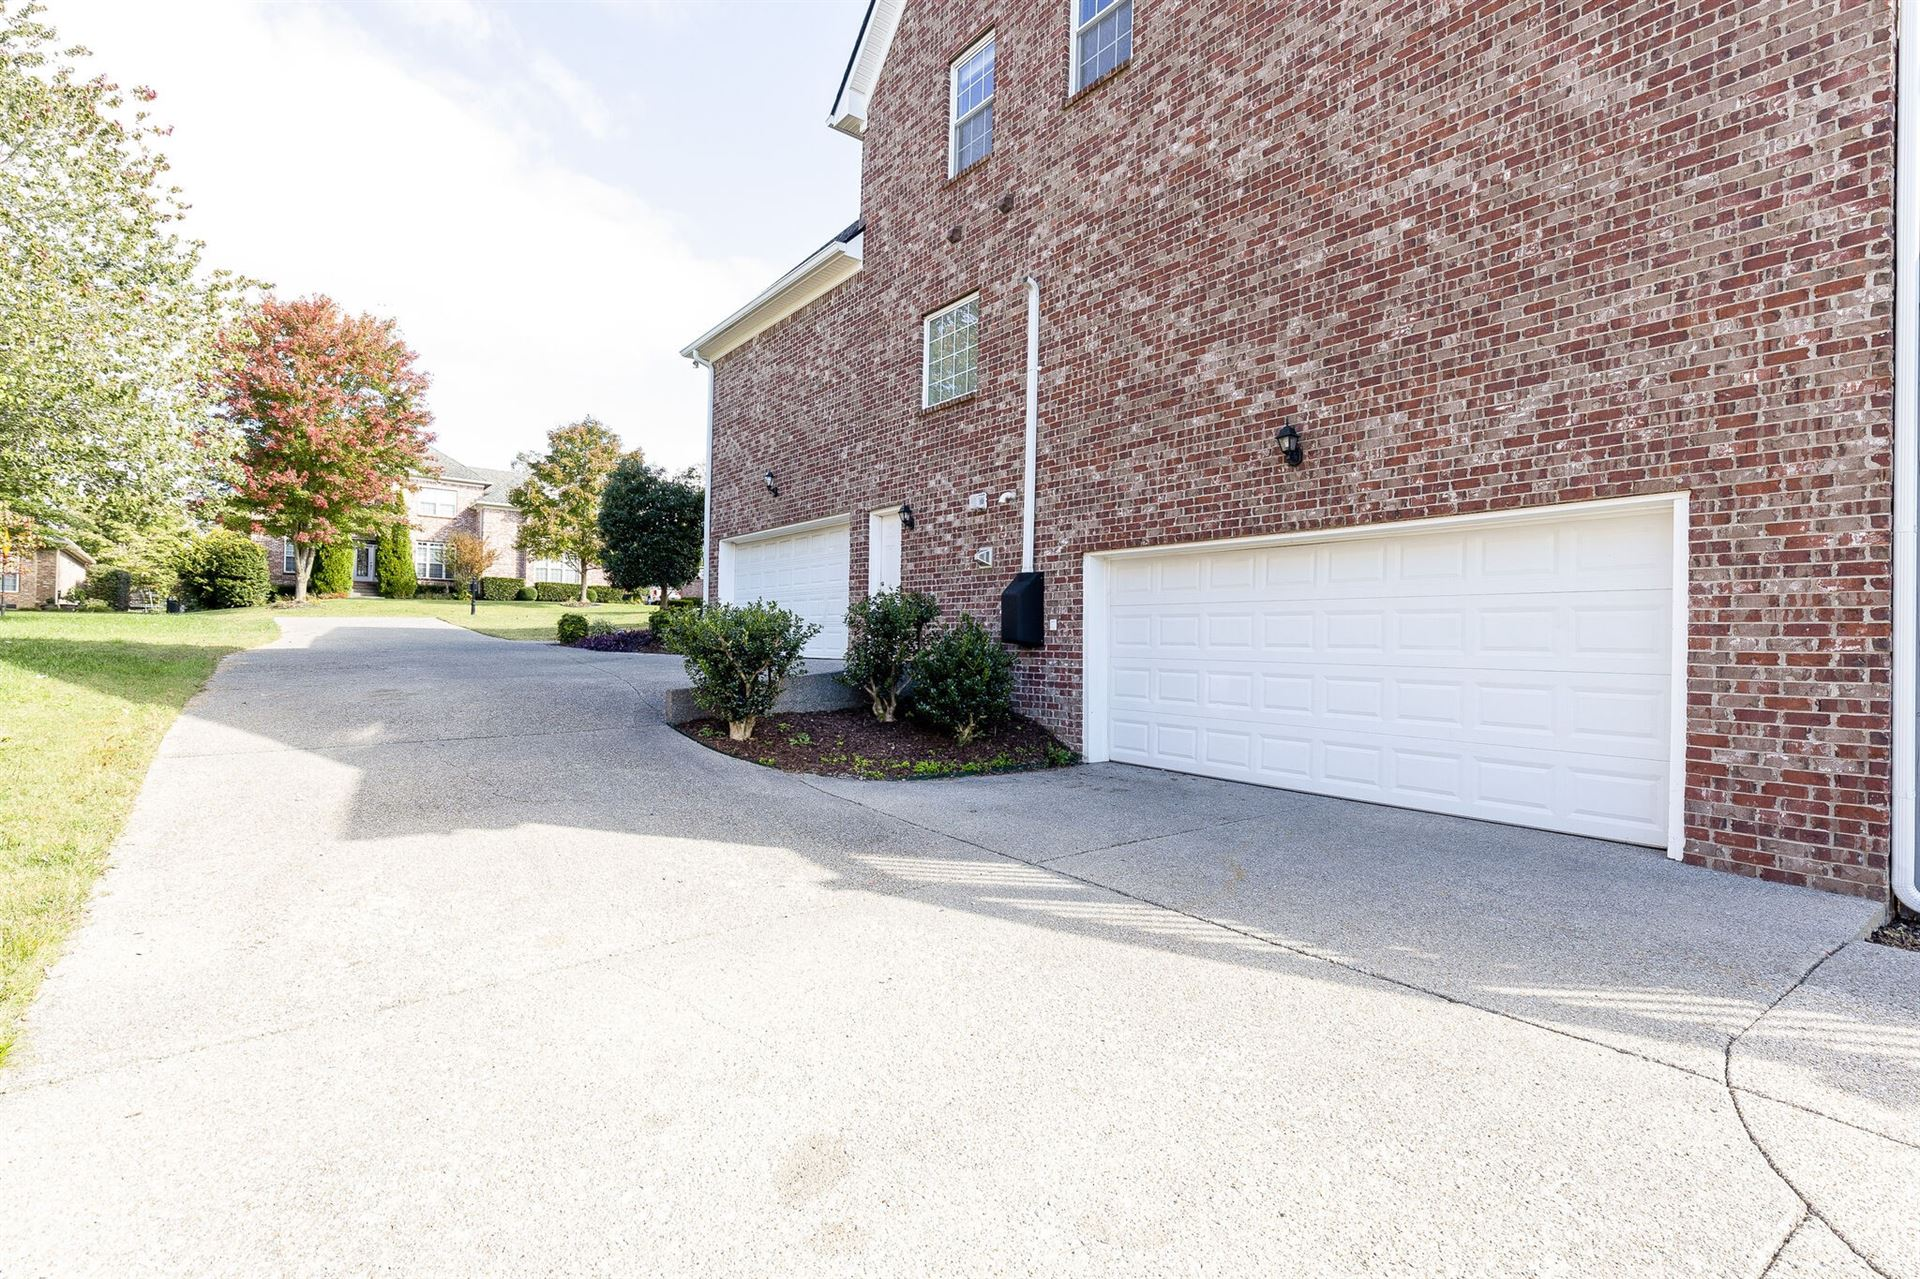 Photo of 1427 Savannah Park Dr, Spring Hill, TN 37174 (MLS # 2300636)